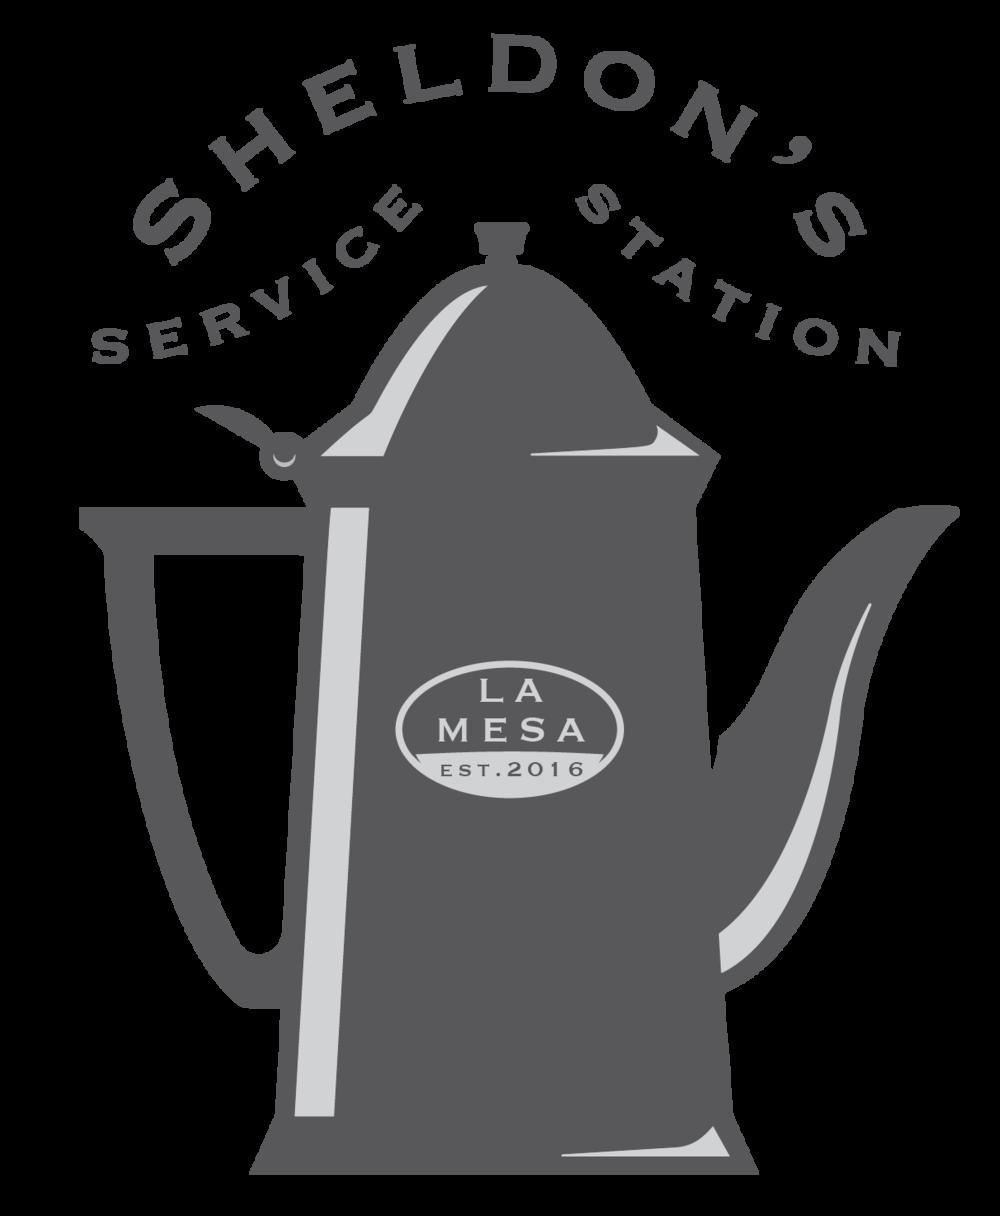 Sheldons-Alt-Logo.png